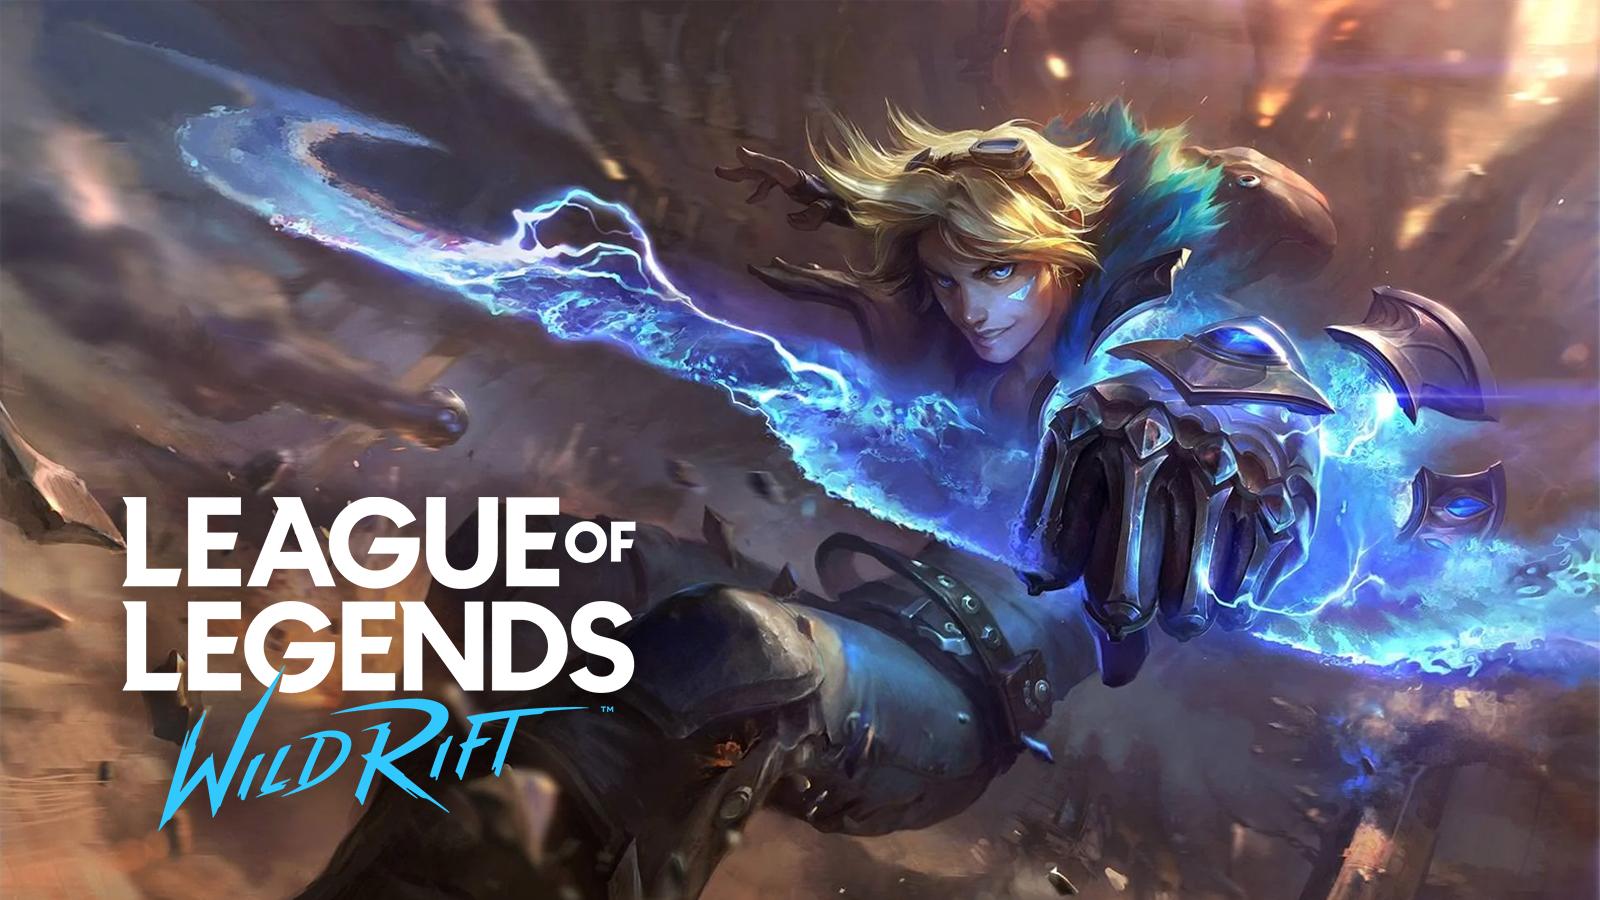 Ezreal in League of Legends Wild Rift